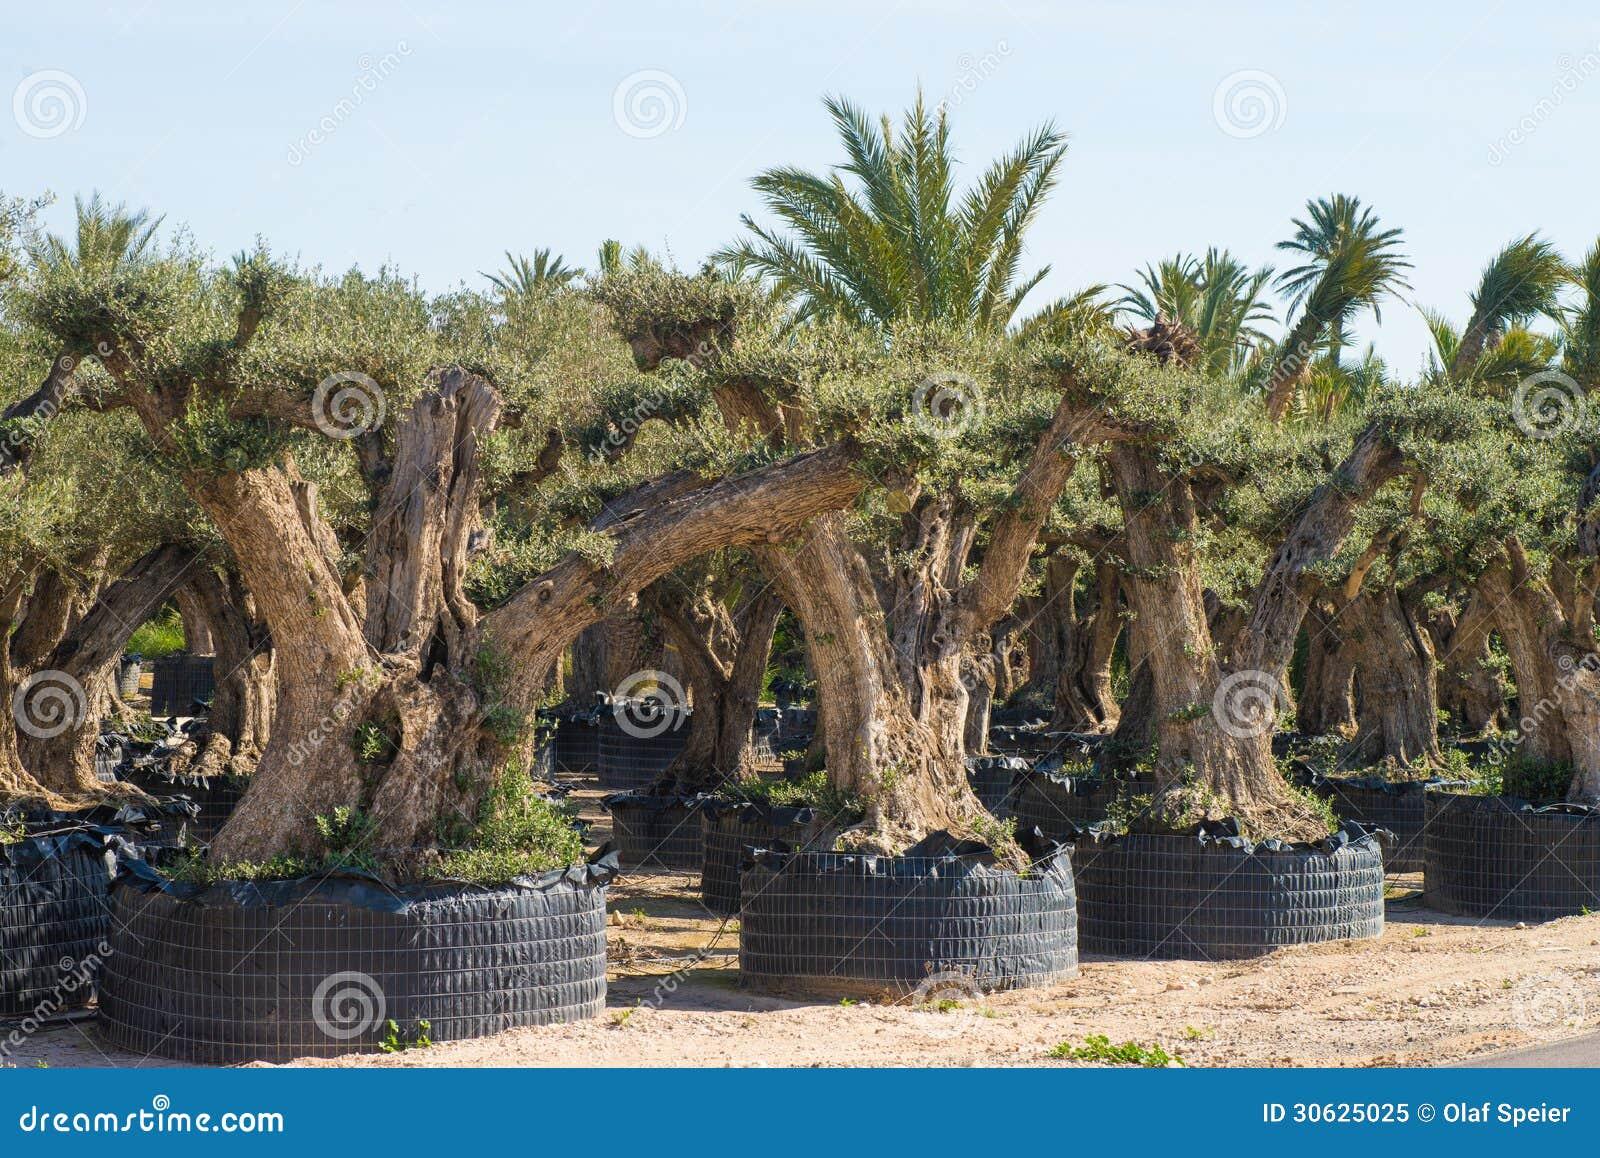 Olive Tree Farm Royalty Free Stock Photo Image 30625025